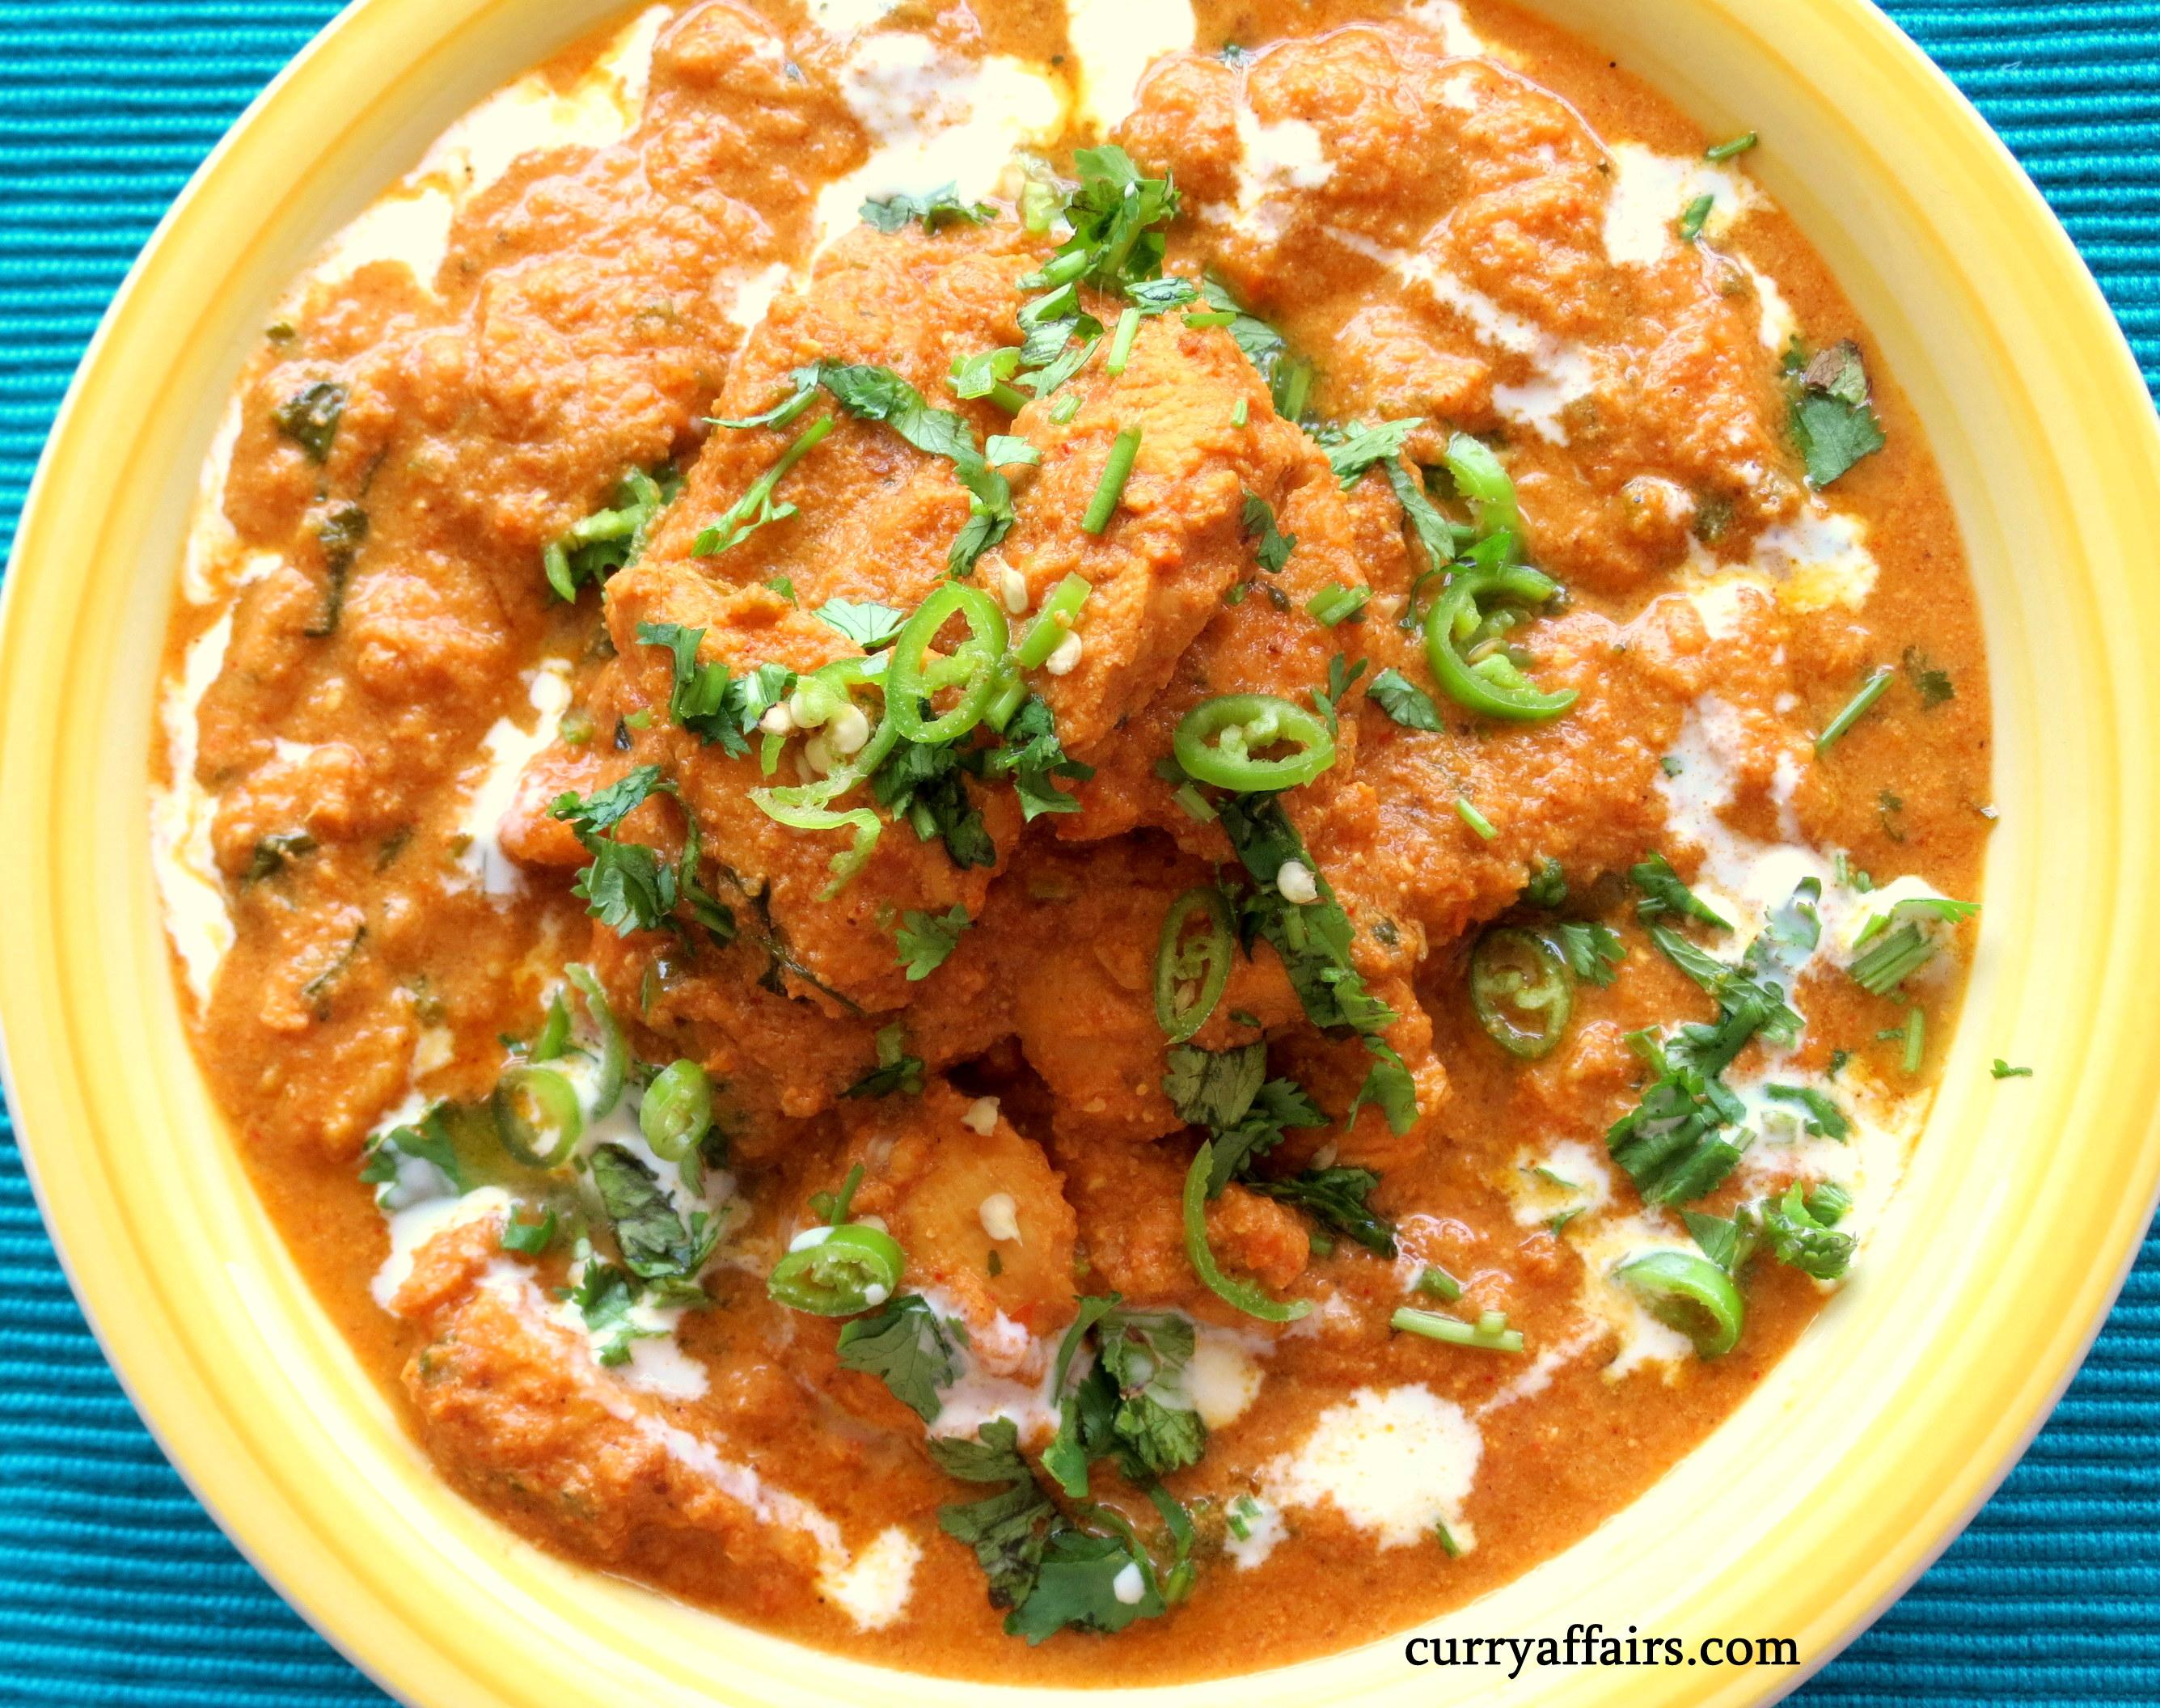 Amritsari murgh makhani for Amritsari cuisine